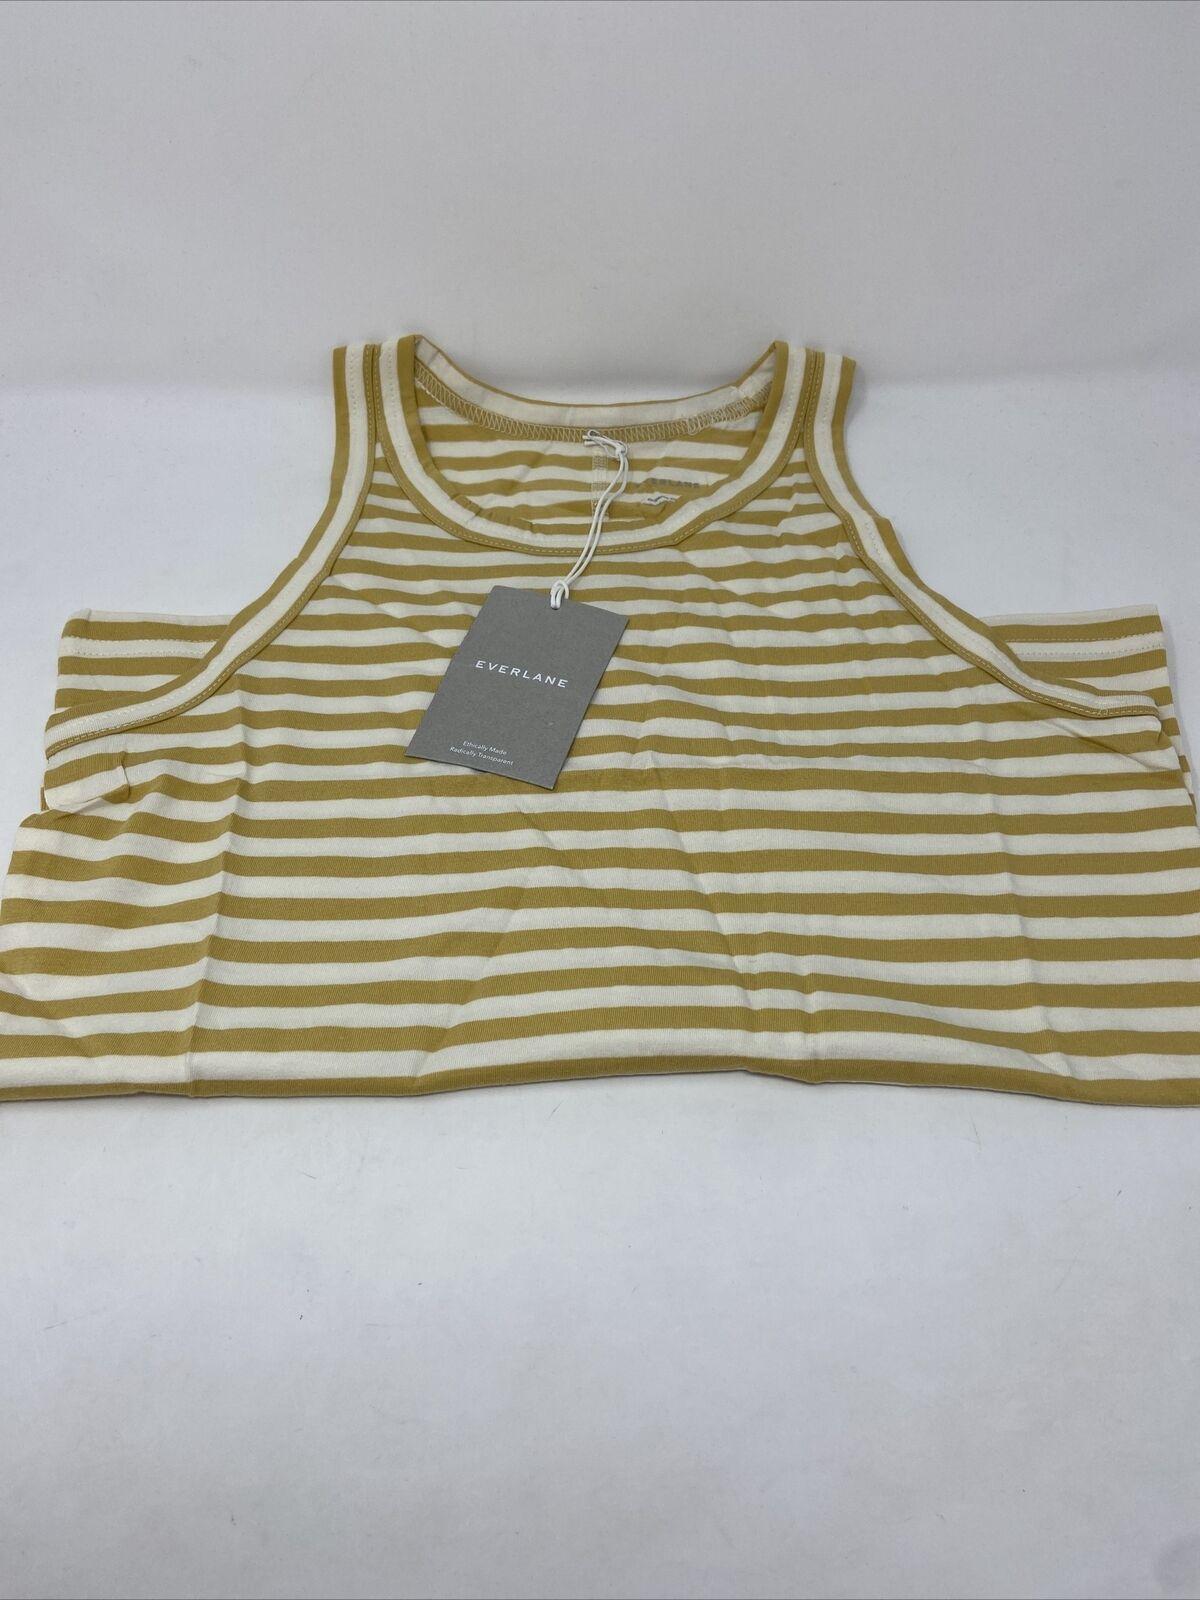 Everlane Organic Cotton Cutaway Tank Golden Stripe Size M Medium New With Tags